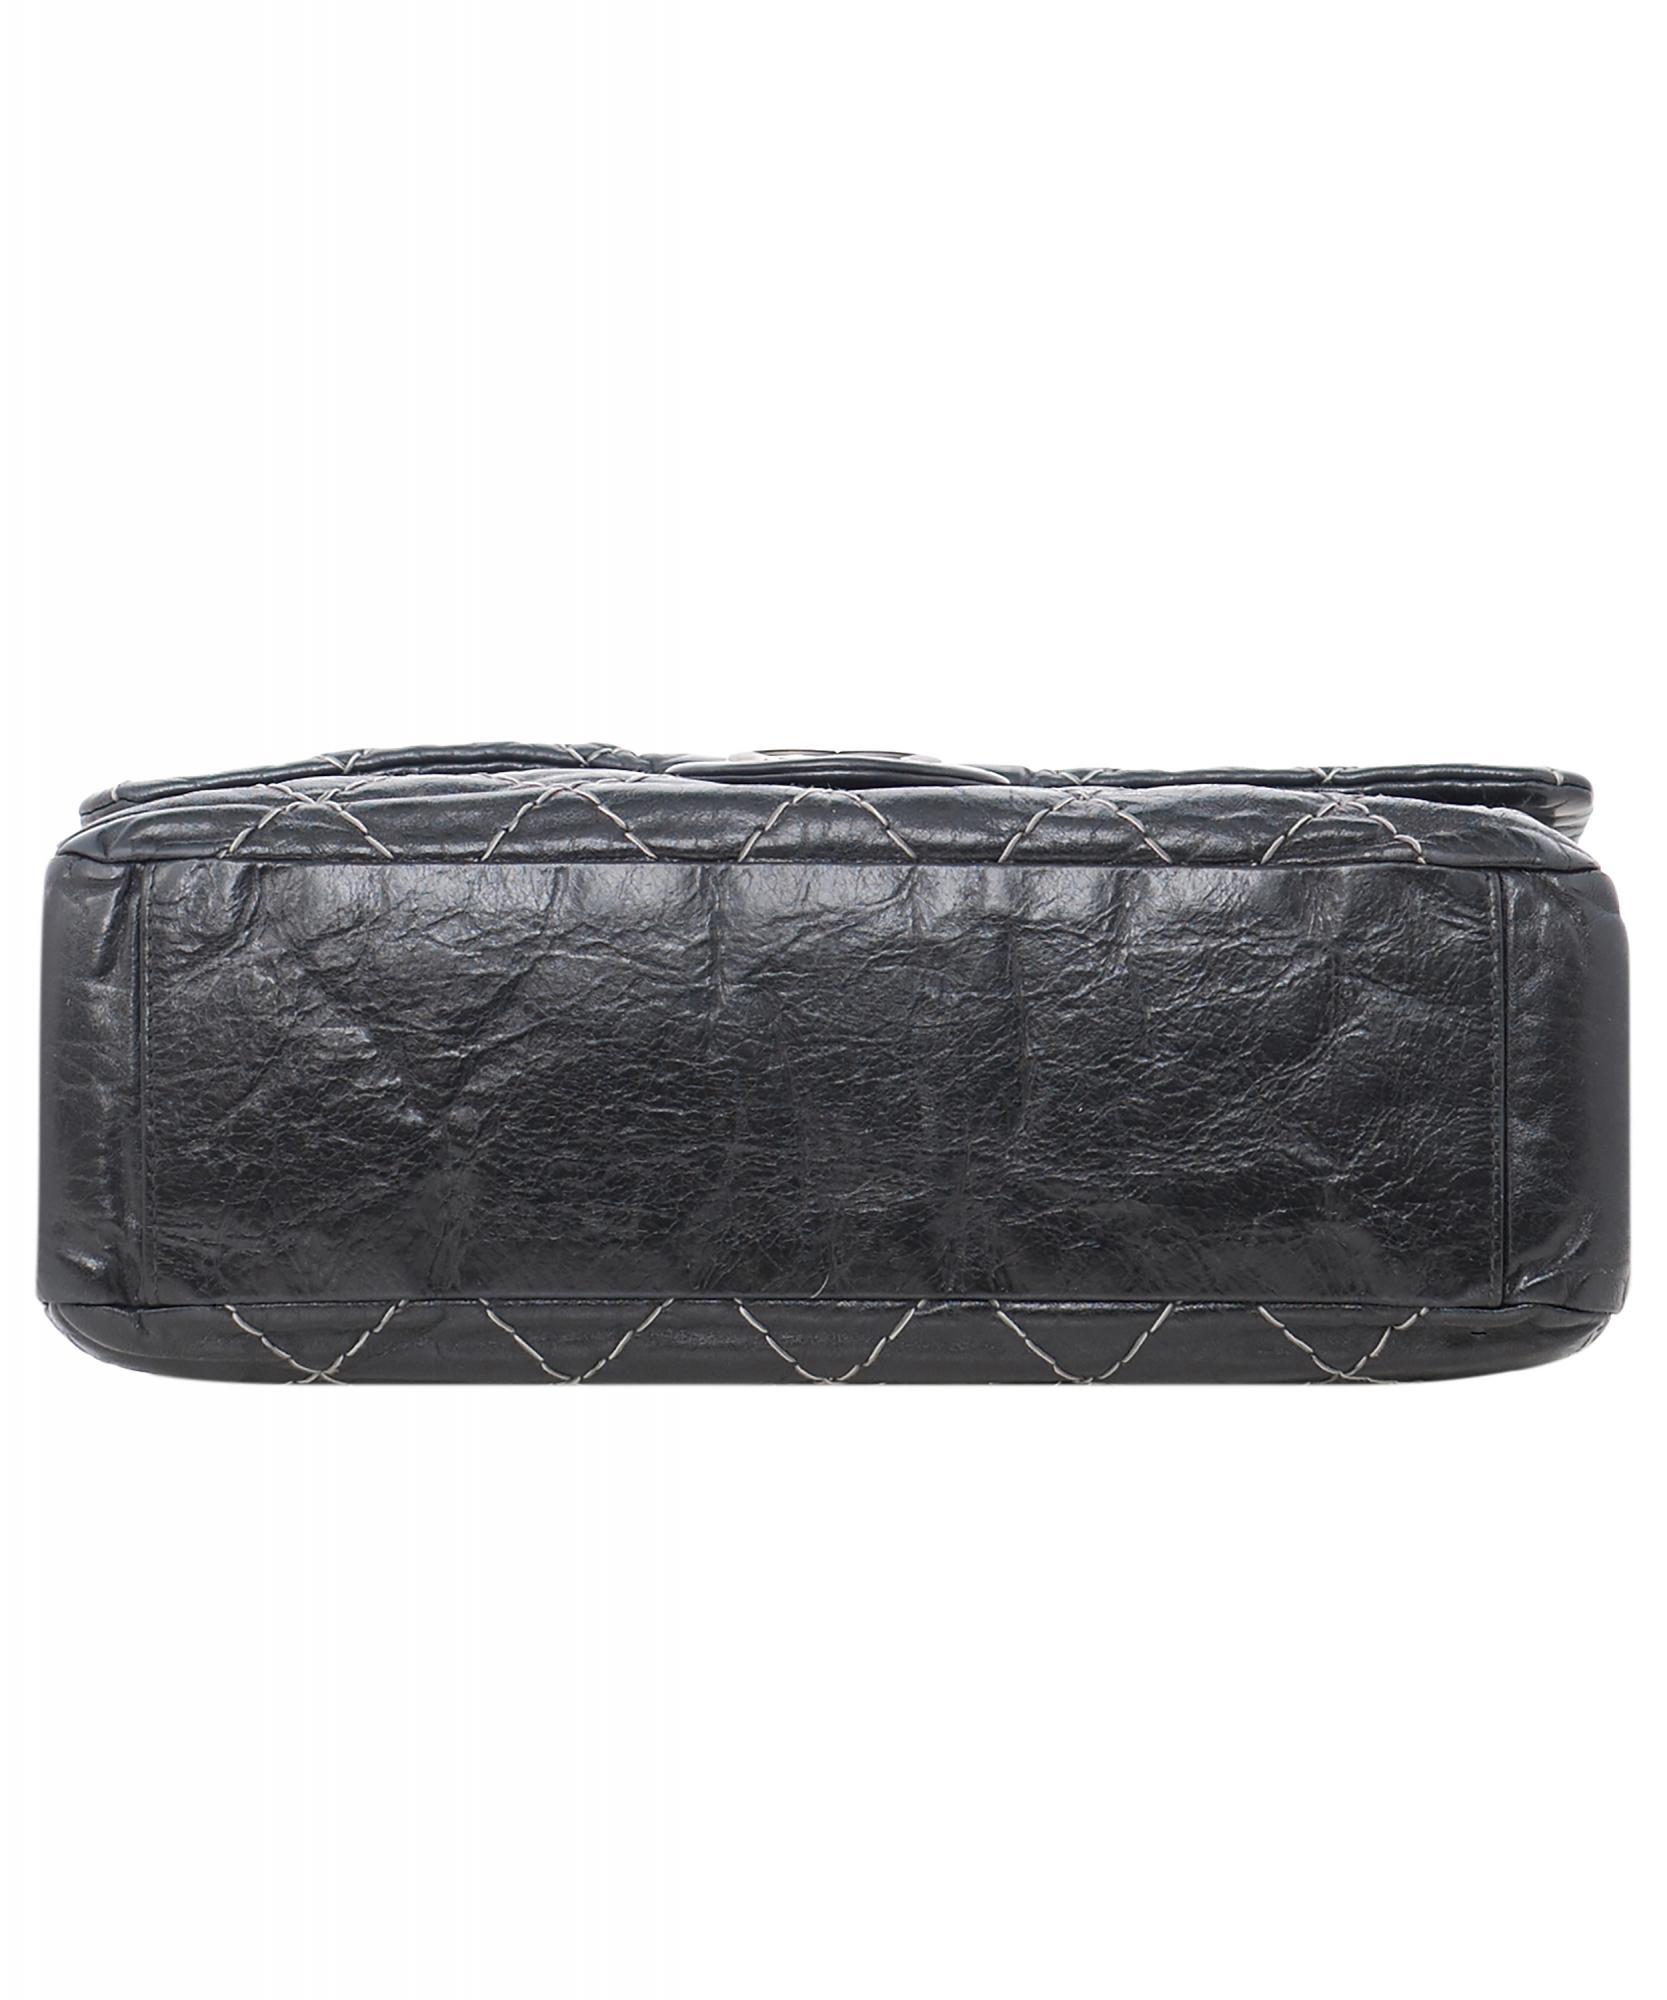 a594581ef35b63 ... Chanel Black Glazed Goatskin Contrast Double Stitch Flap Bag. Touch to  zoom